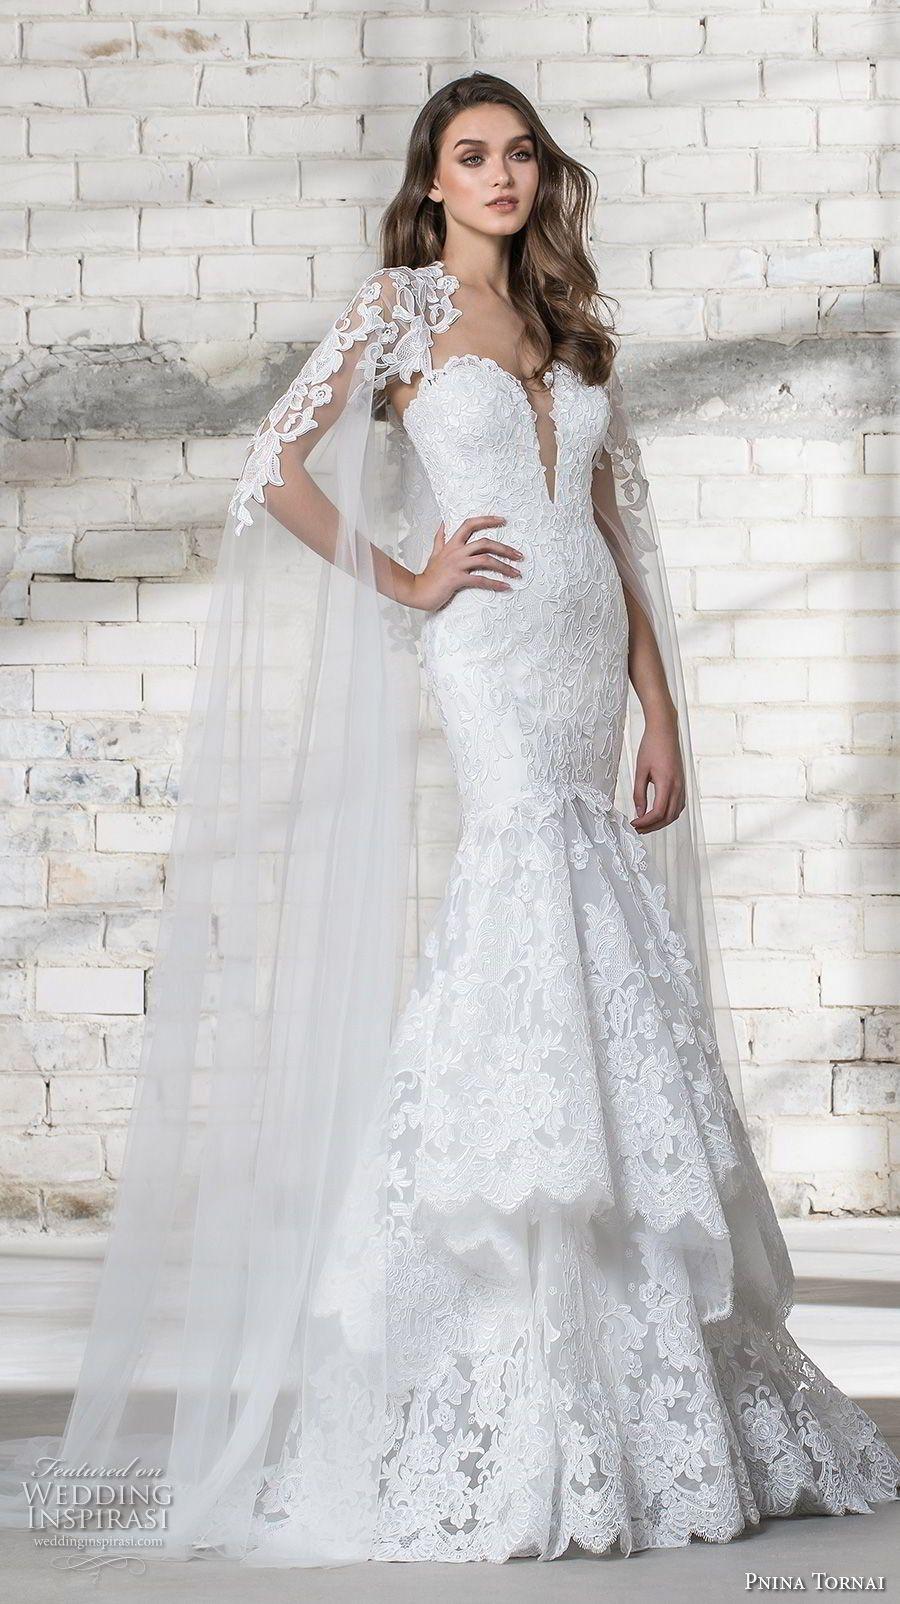 Simple elegant wedding dress designers  Pin by CamelliaMT  on Wedding dress  Pinterest  Wedding